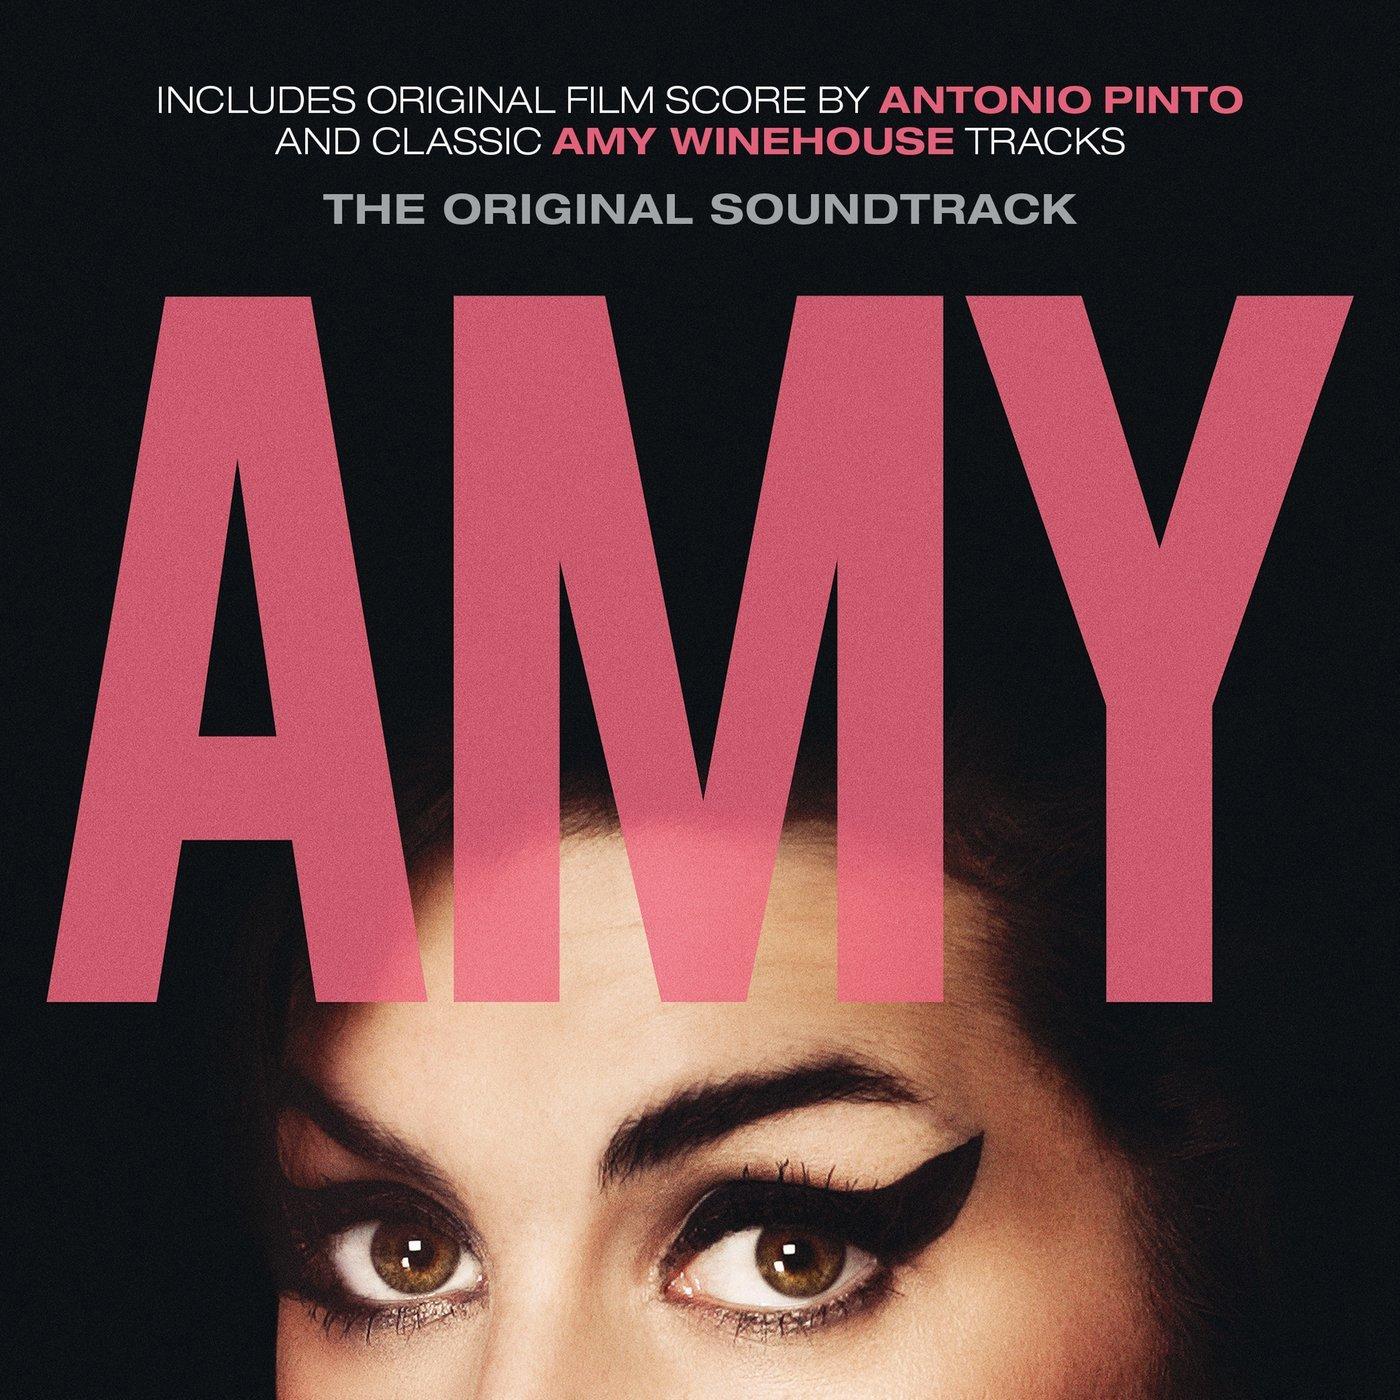 Amy Winehouse - AMY OST Double Vinyl LP - £11.99 (Prime) £14.98 (Non Prime) @ Amazon